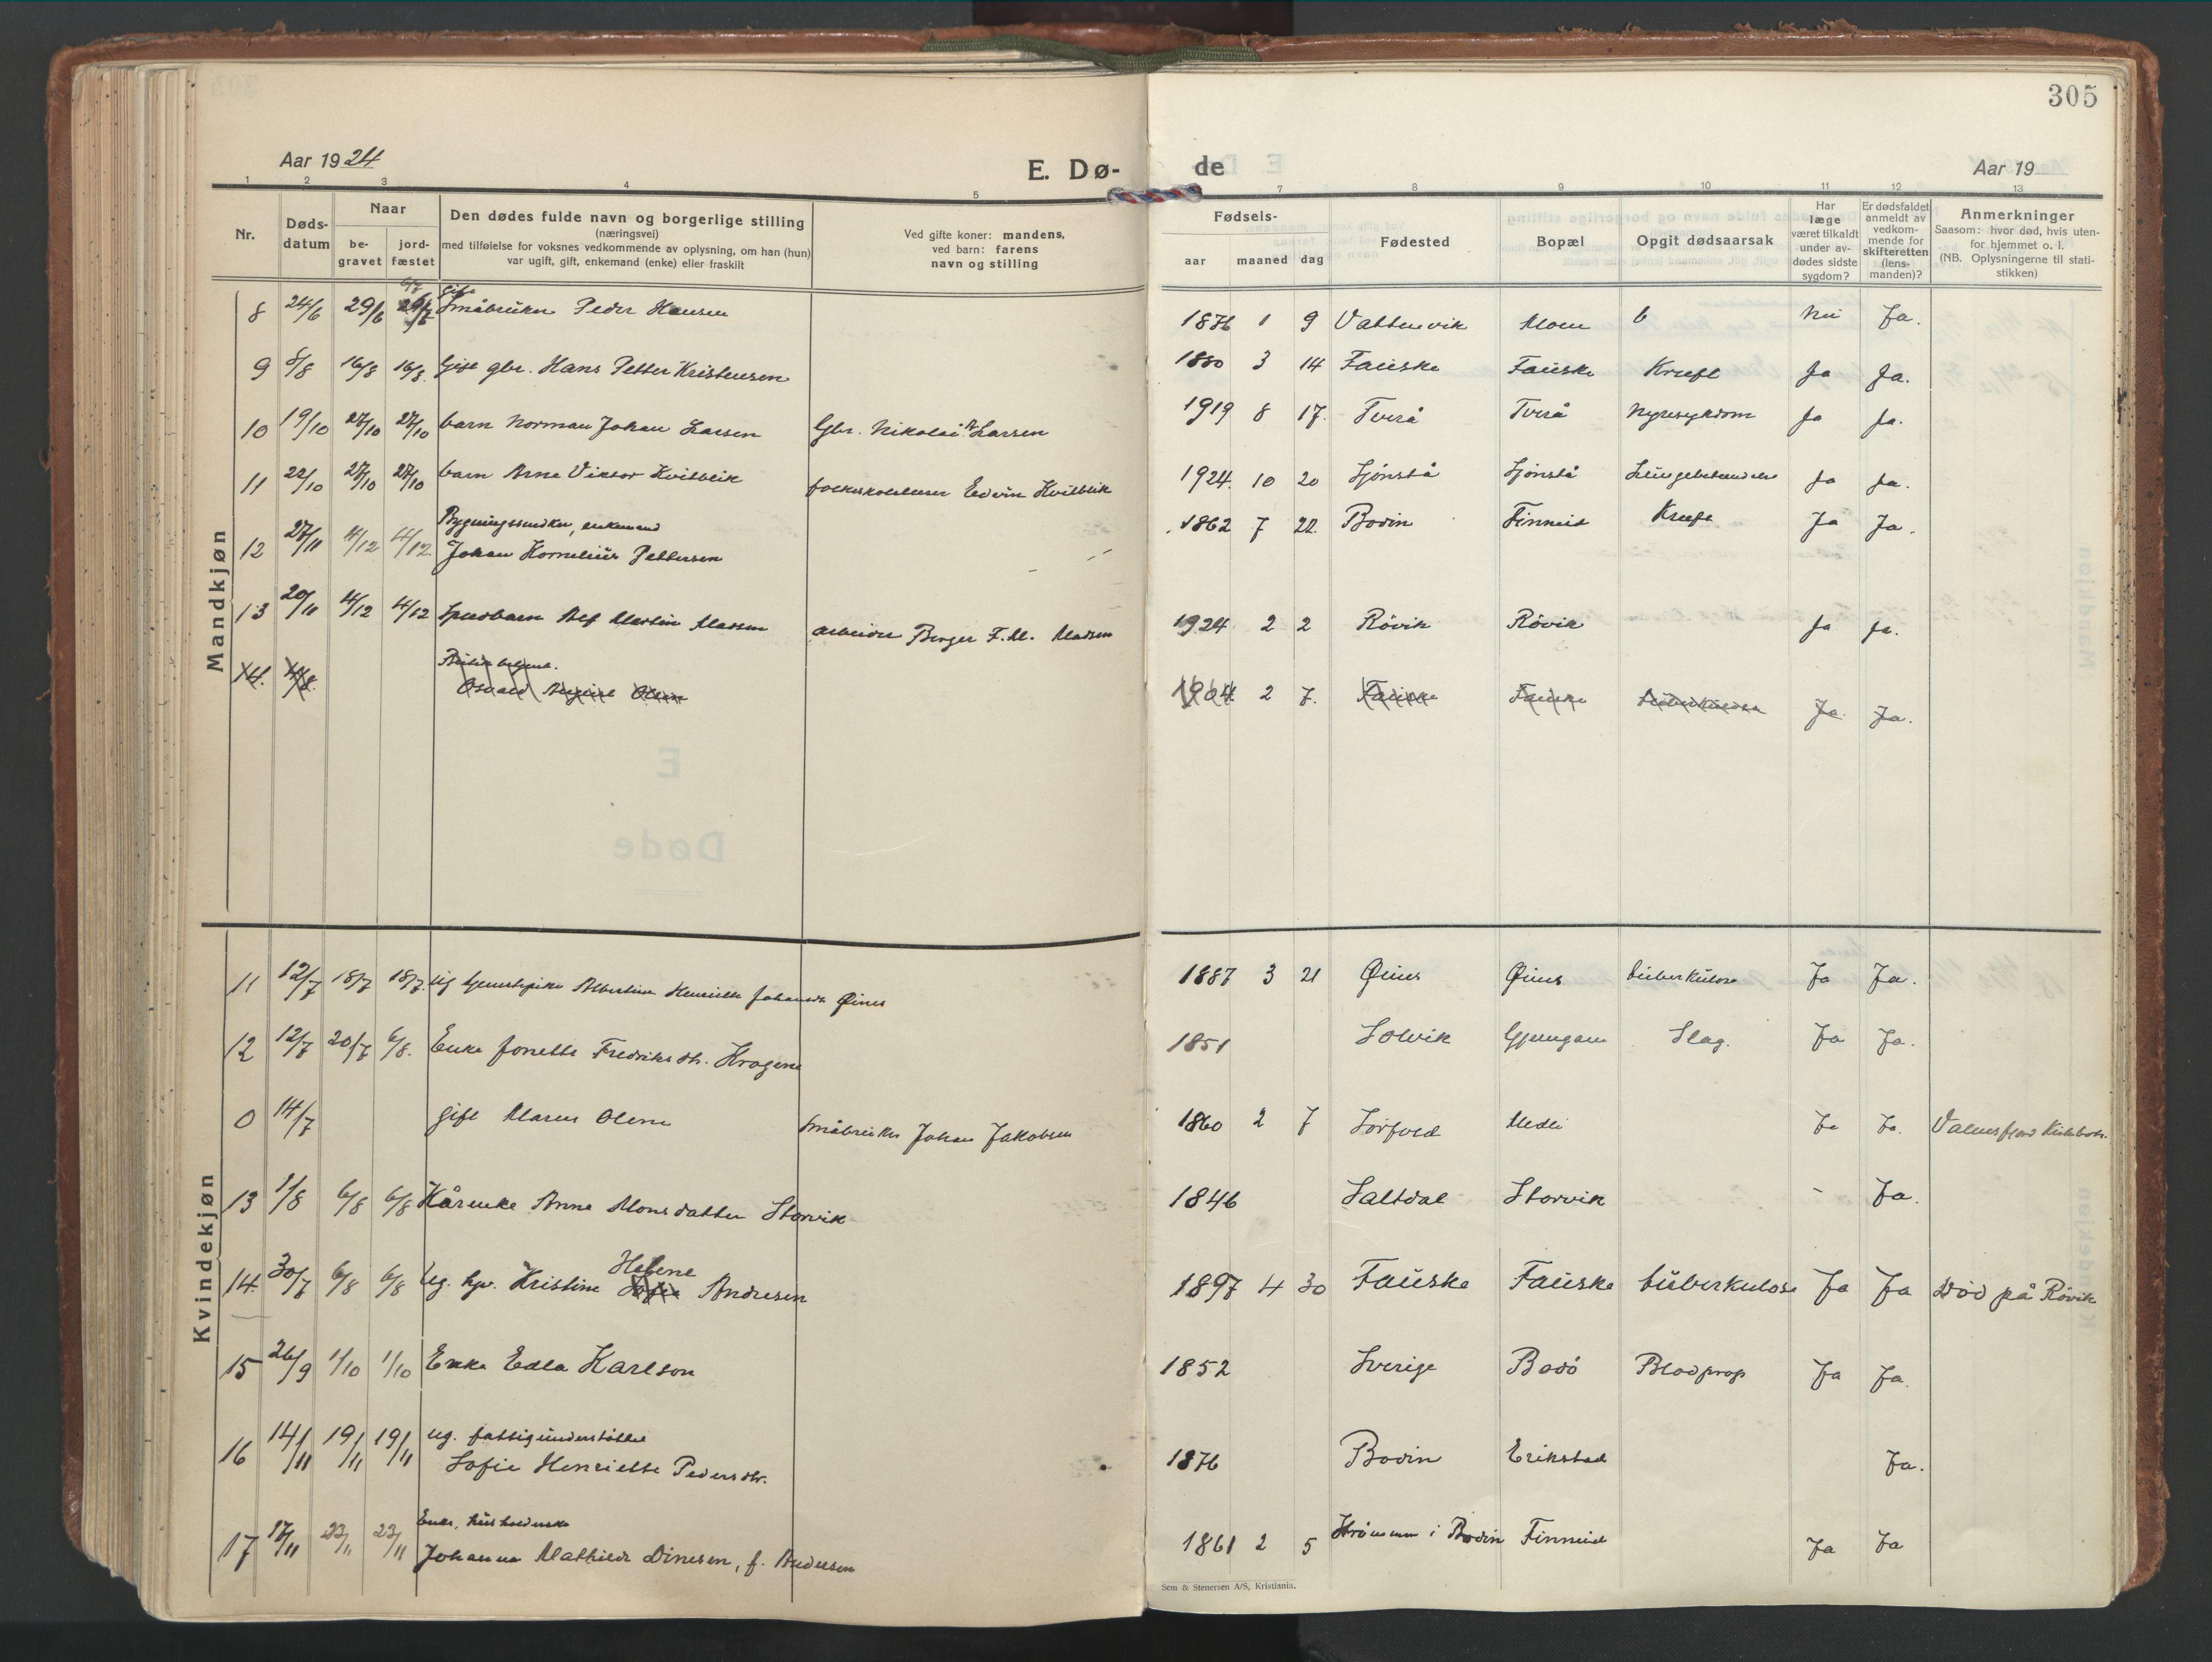 SAT, Ministerialprotokoller, klokkerbøker og fødselsregistre - Nordland, 849/L0699: Ministerialbok nr. 849A10, 1924-1937, s. 305